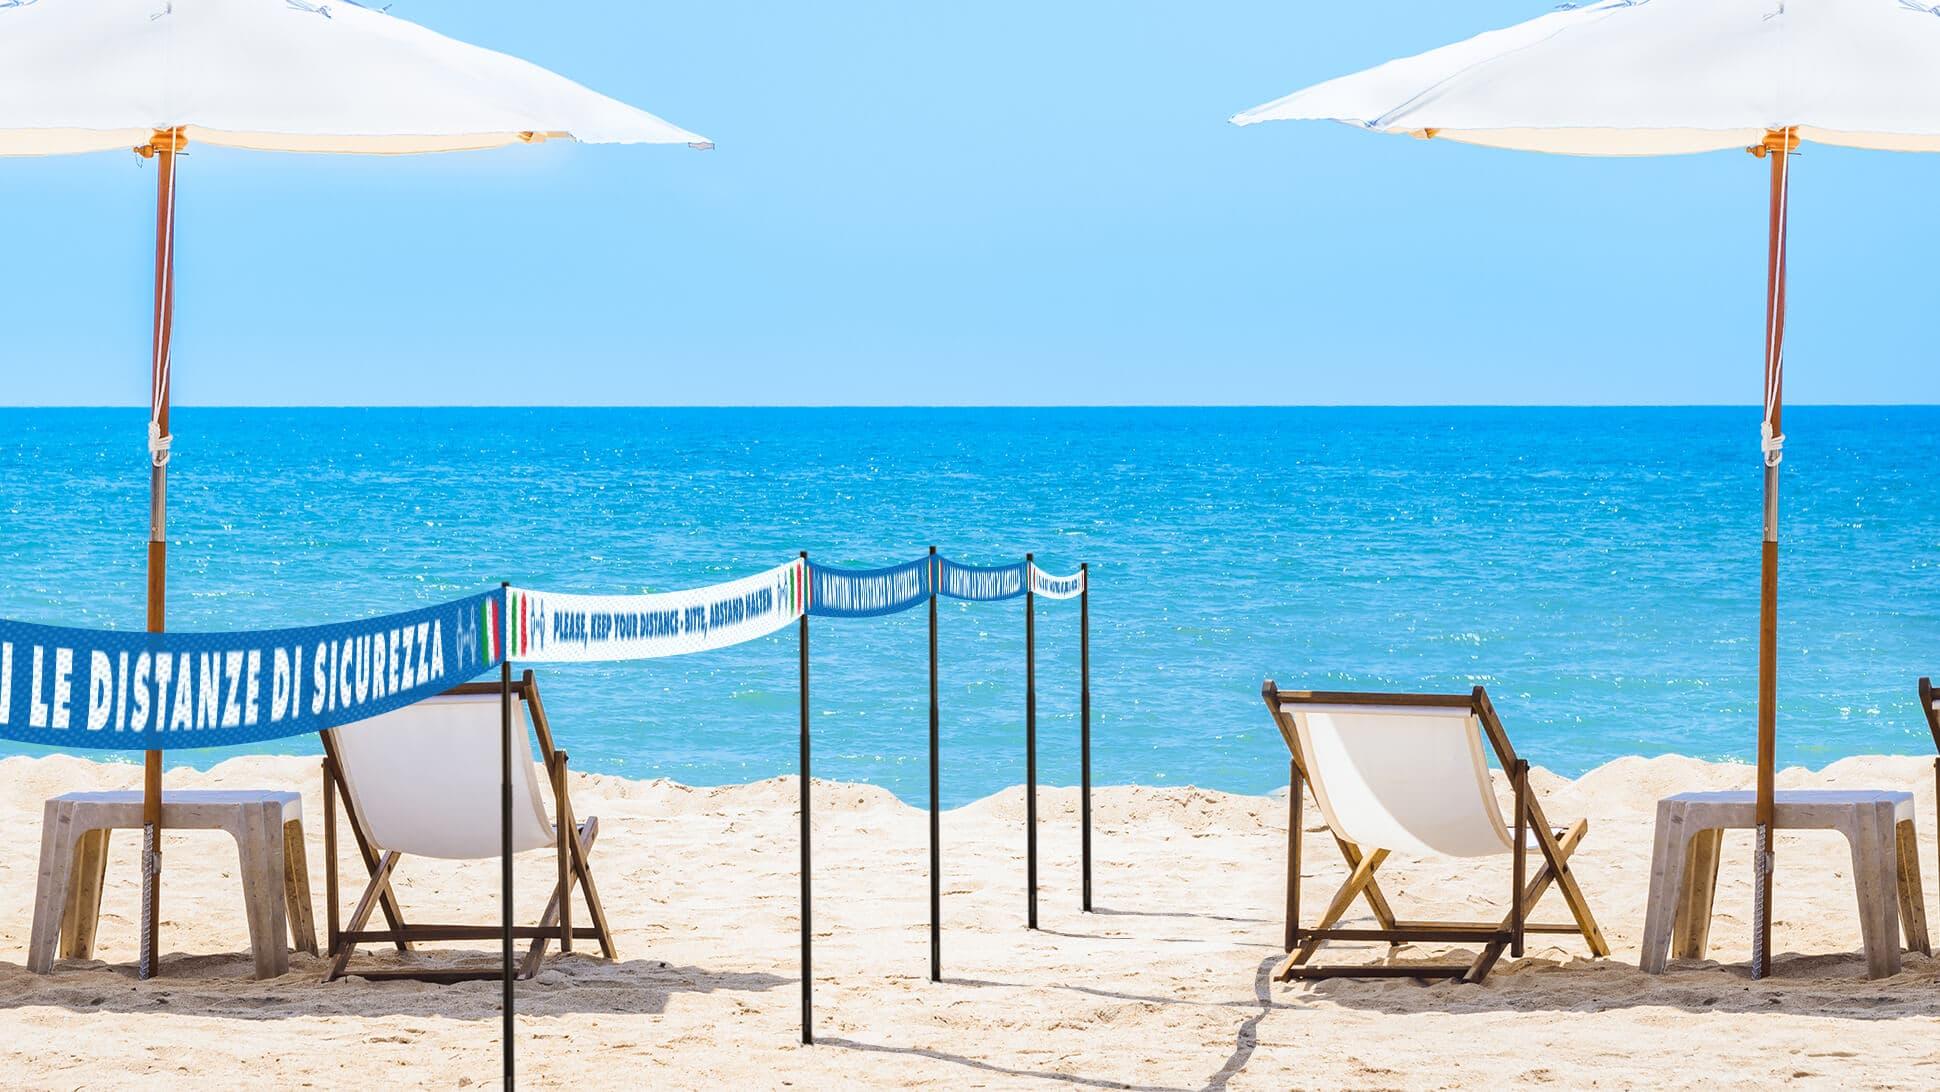 Bandelle per distanza di sicurezza in TNT per spiagge | tictac.it